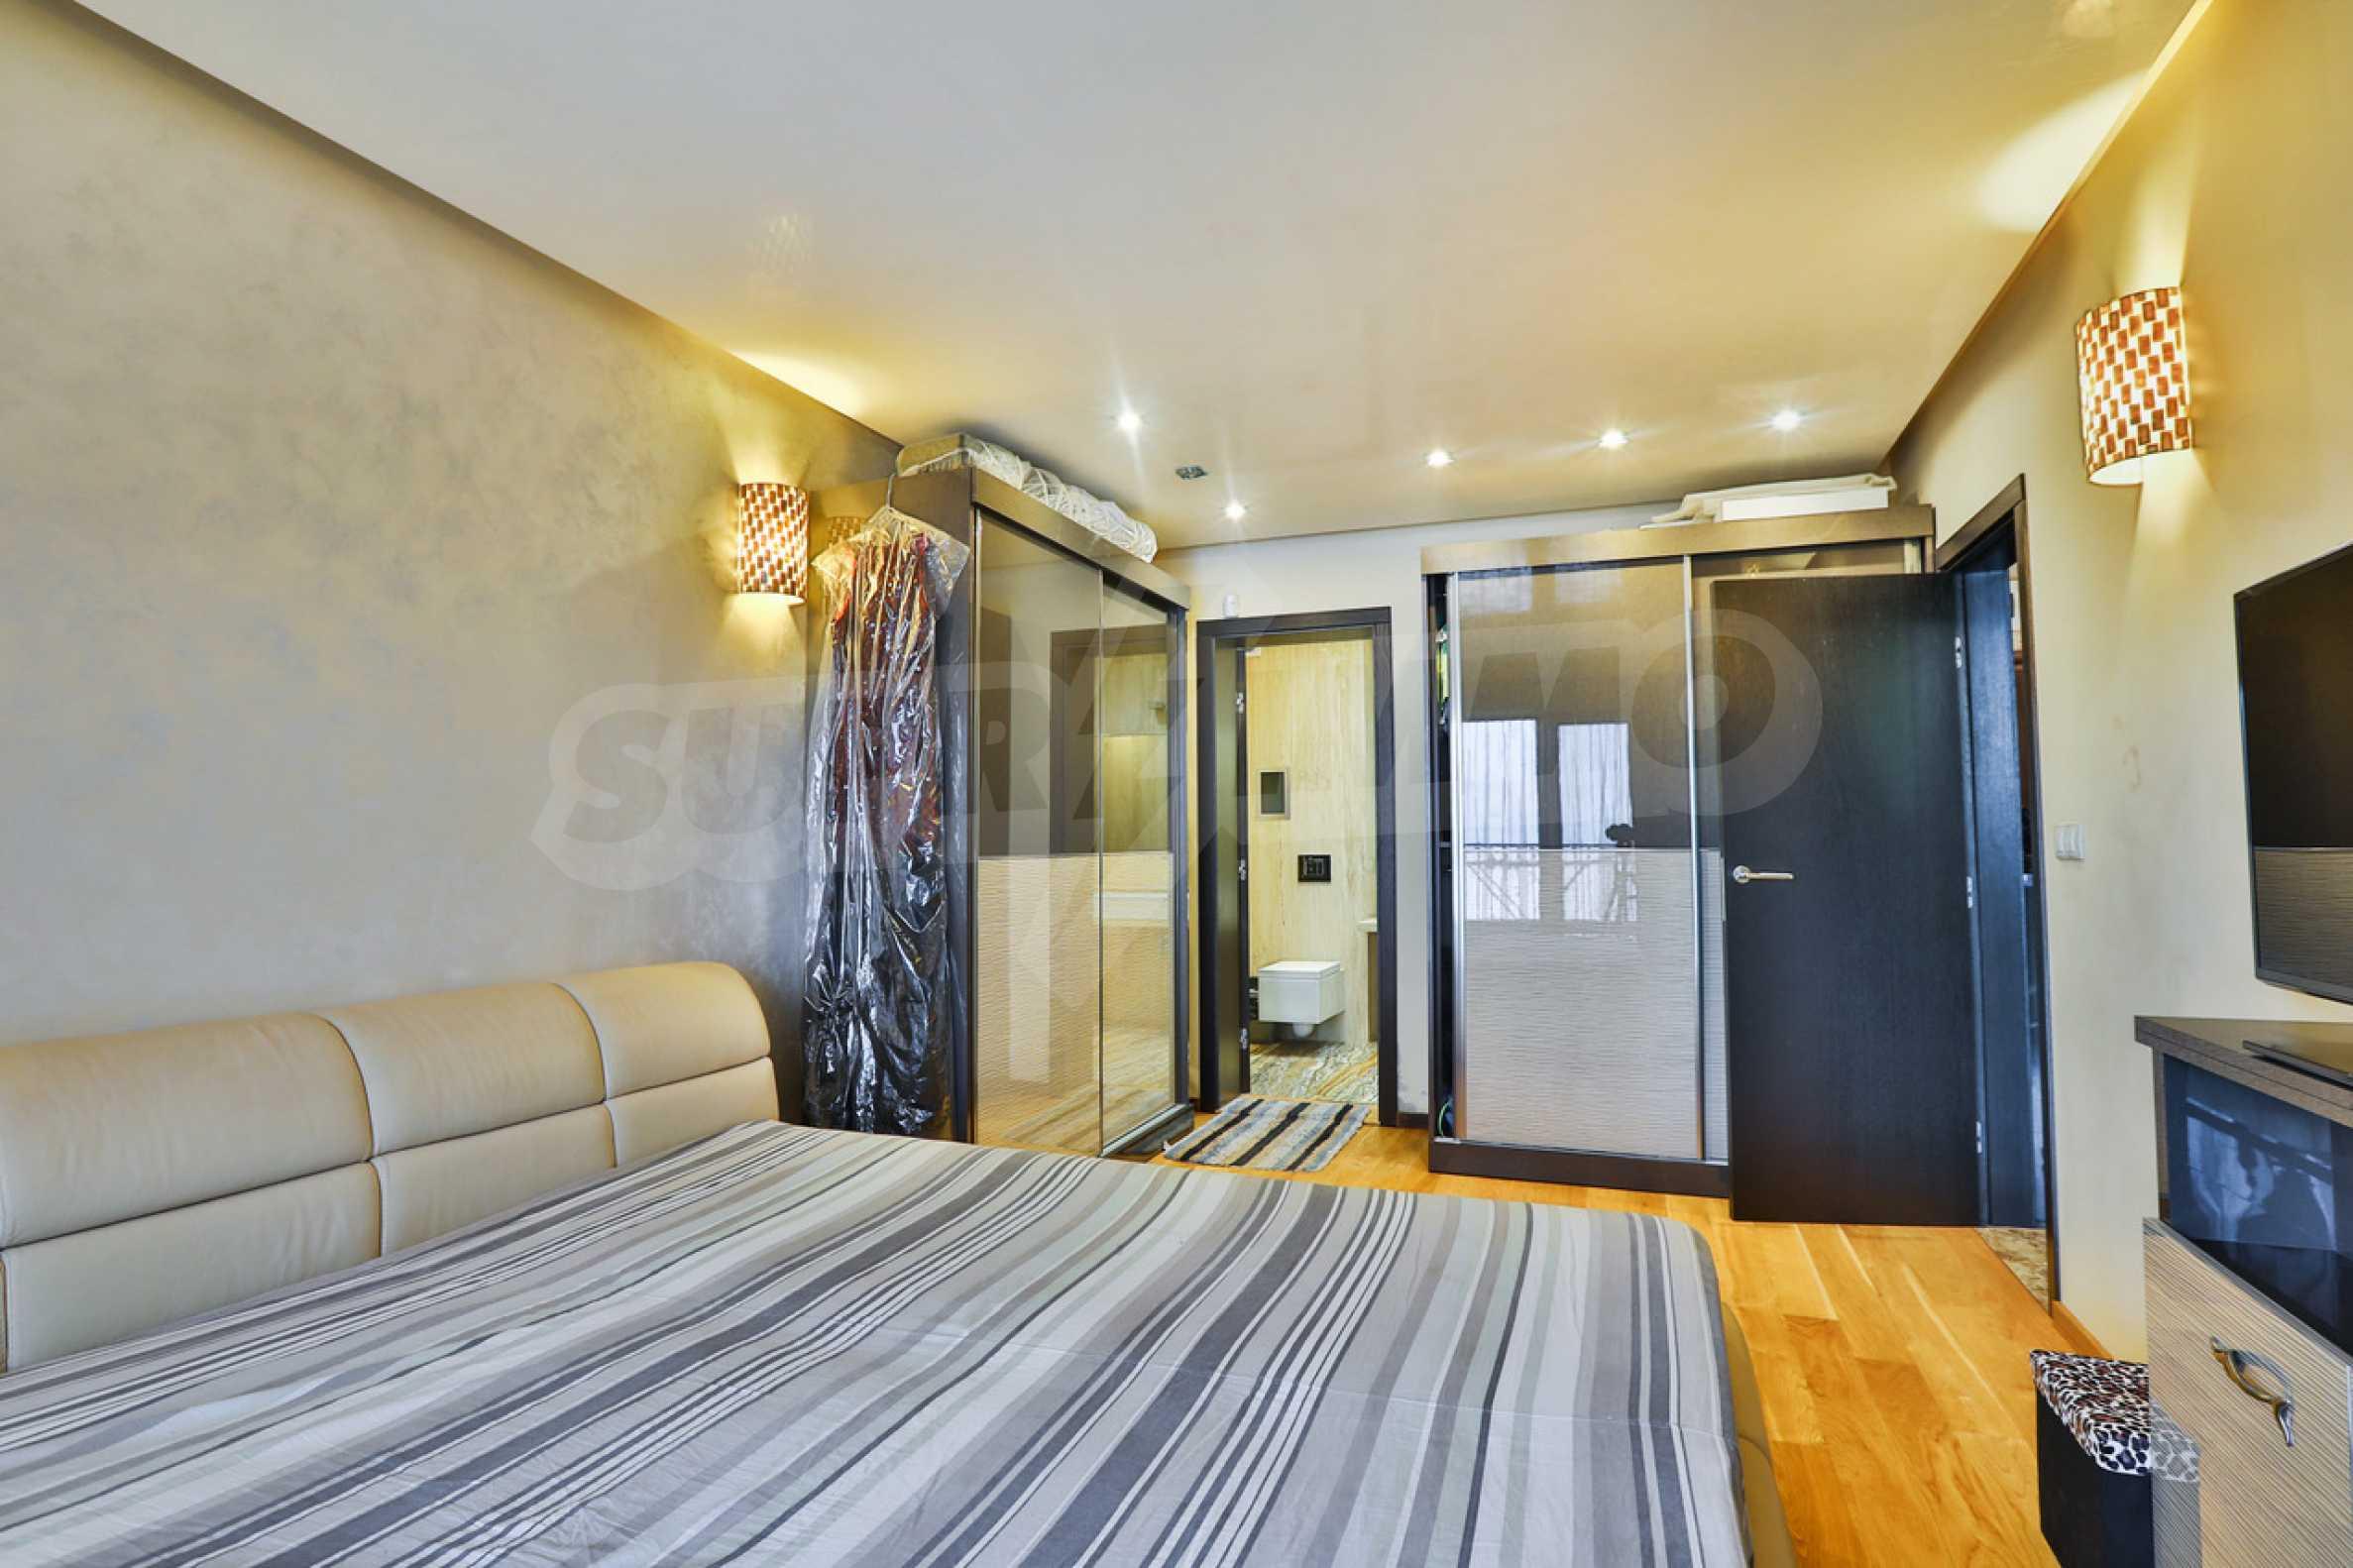 2-bedroom apartment in Sofia 10